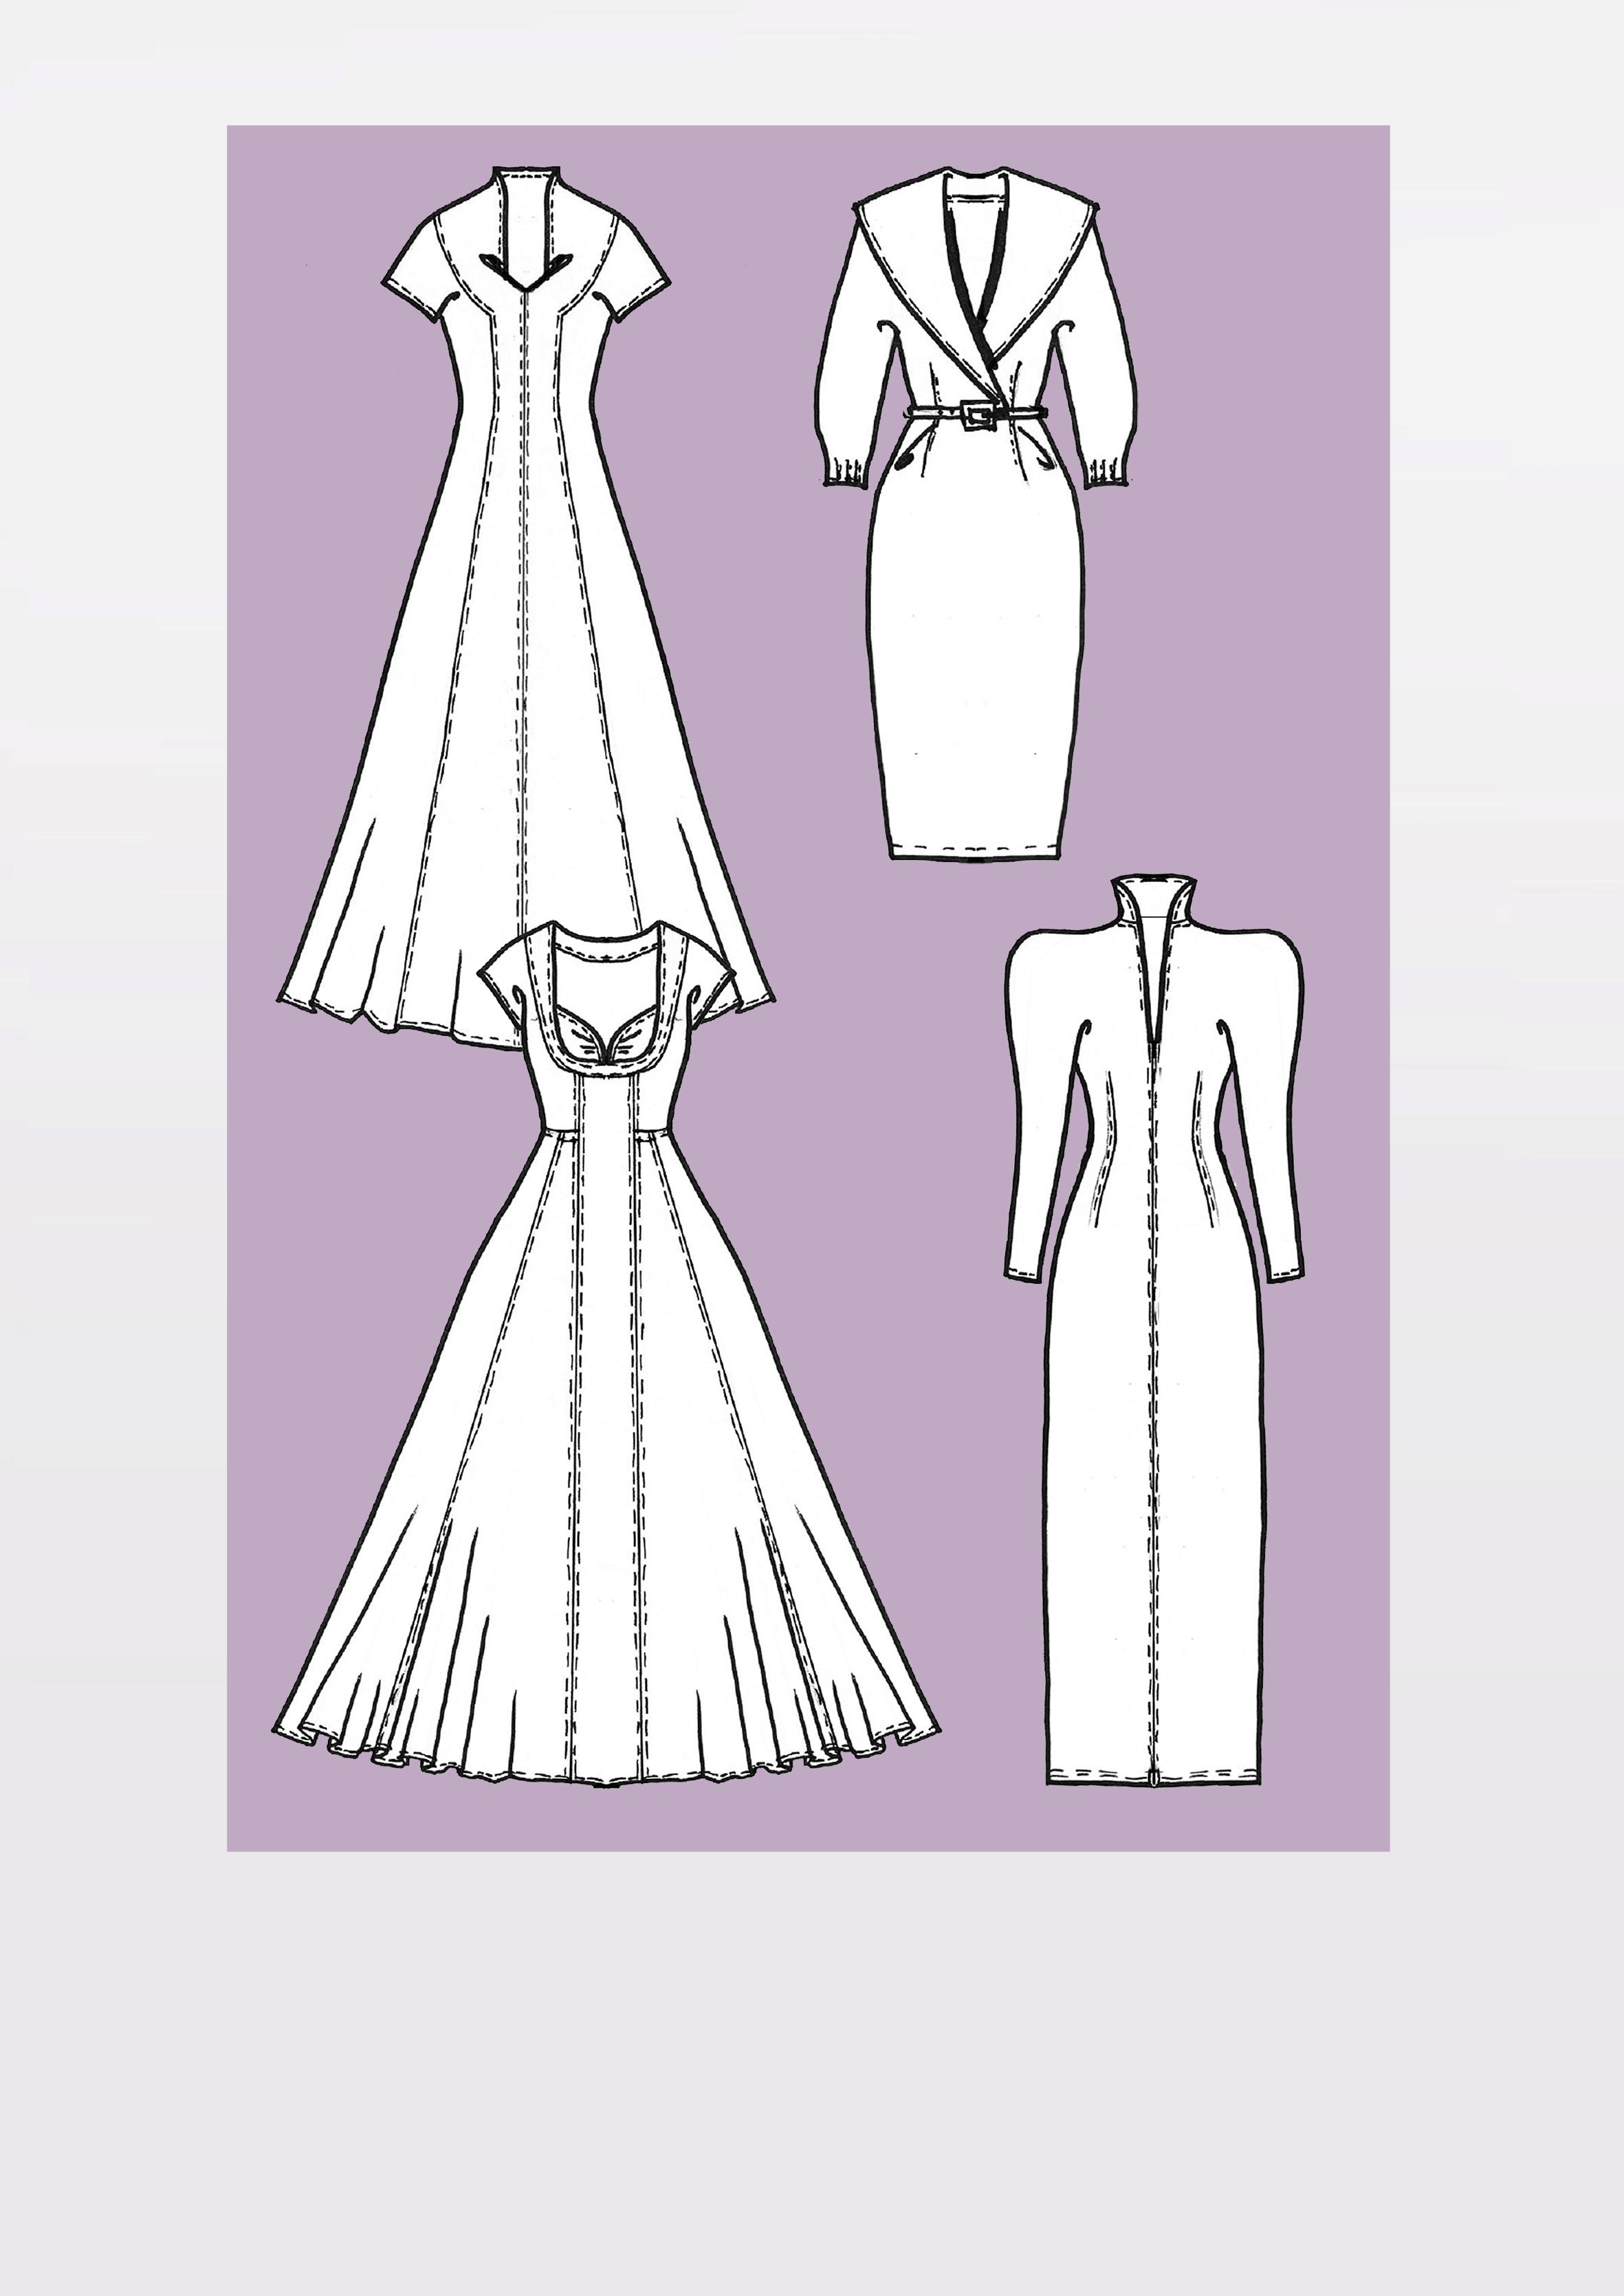 Produkt: Schnitt-Technik Brautkleider